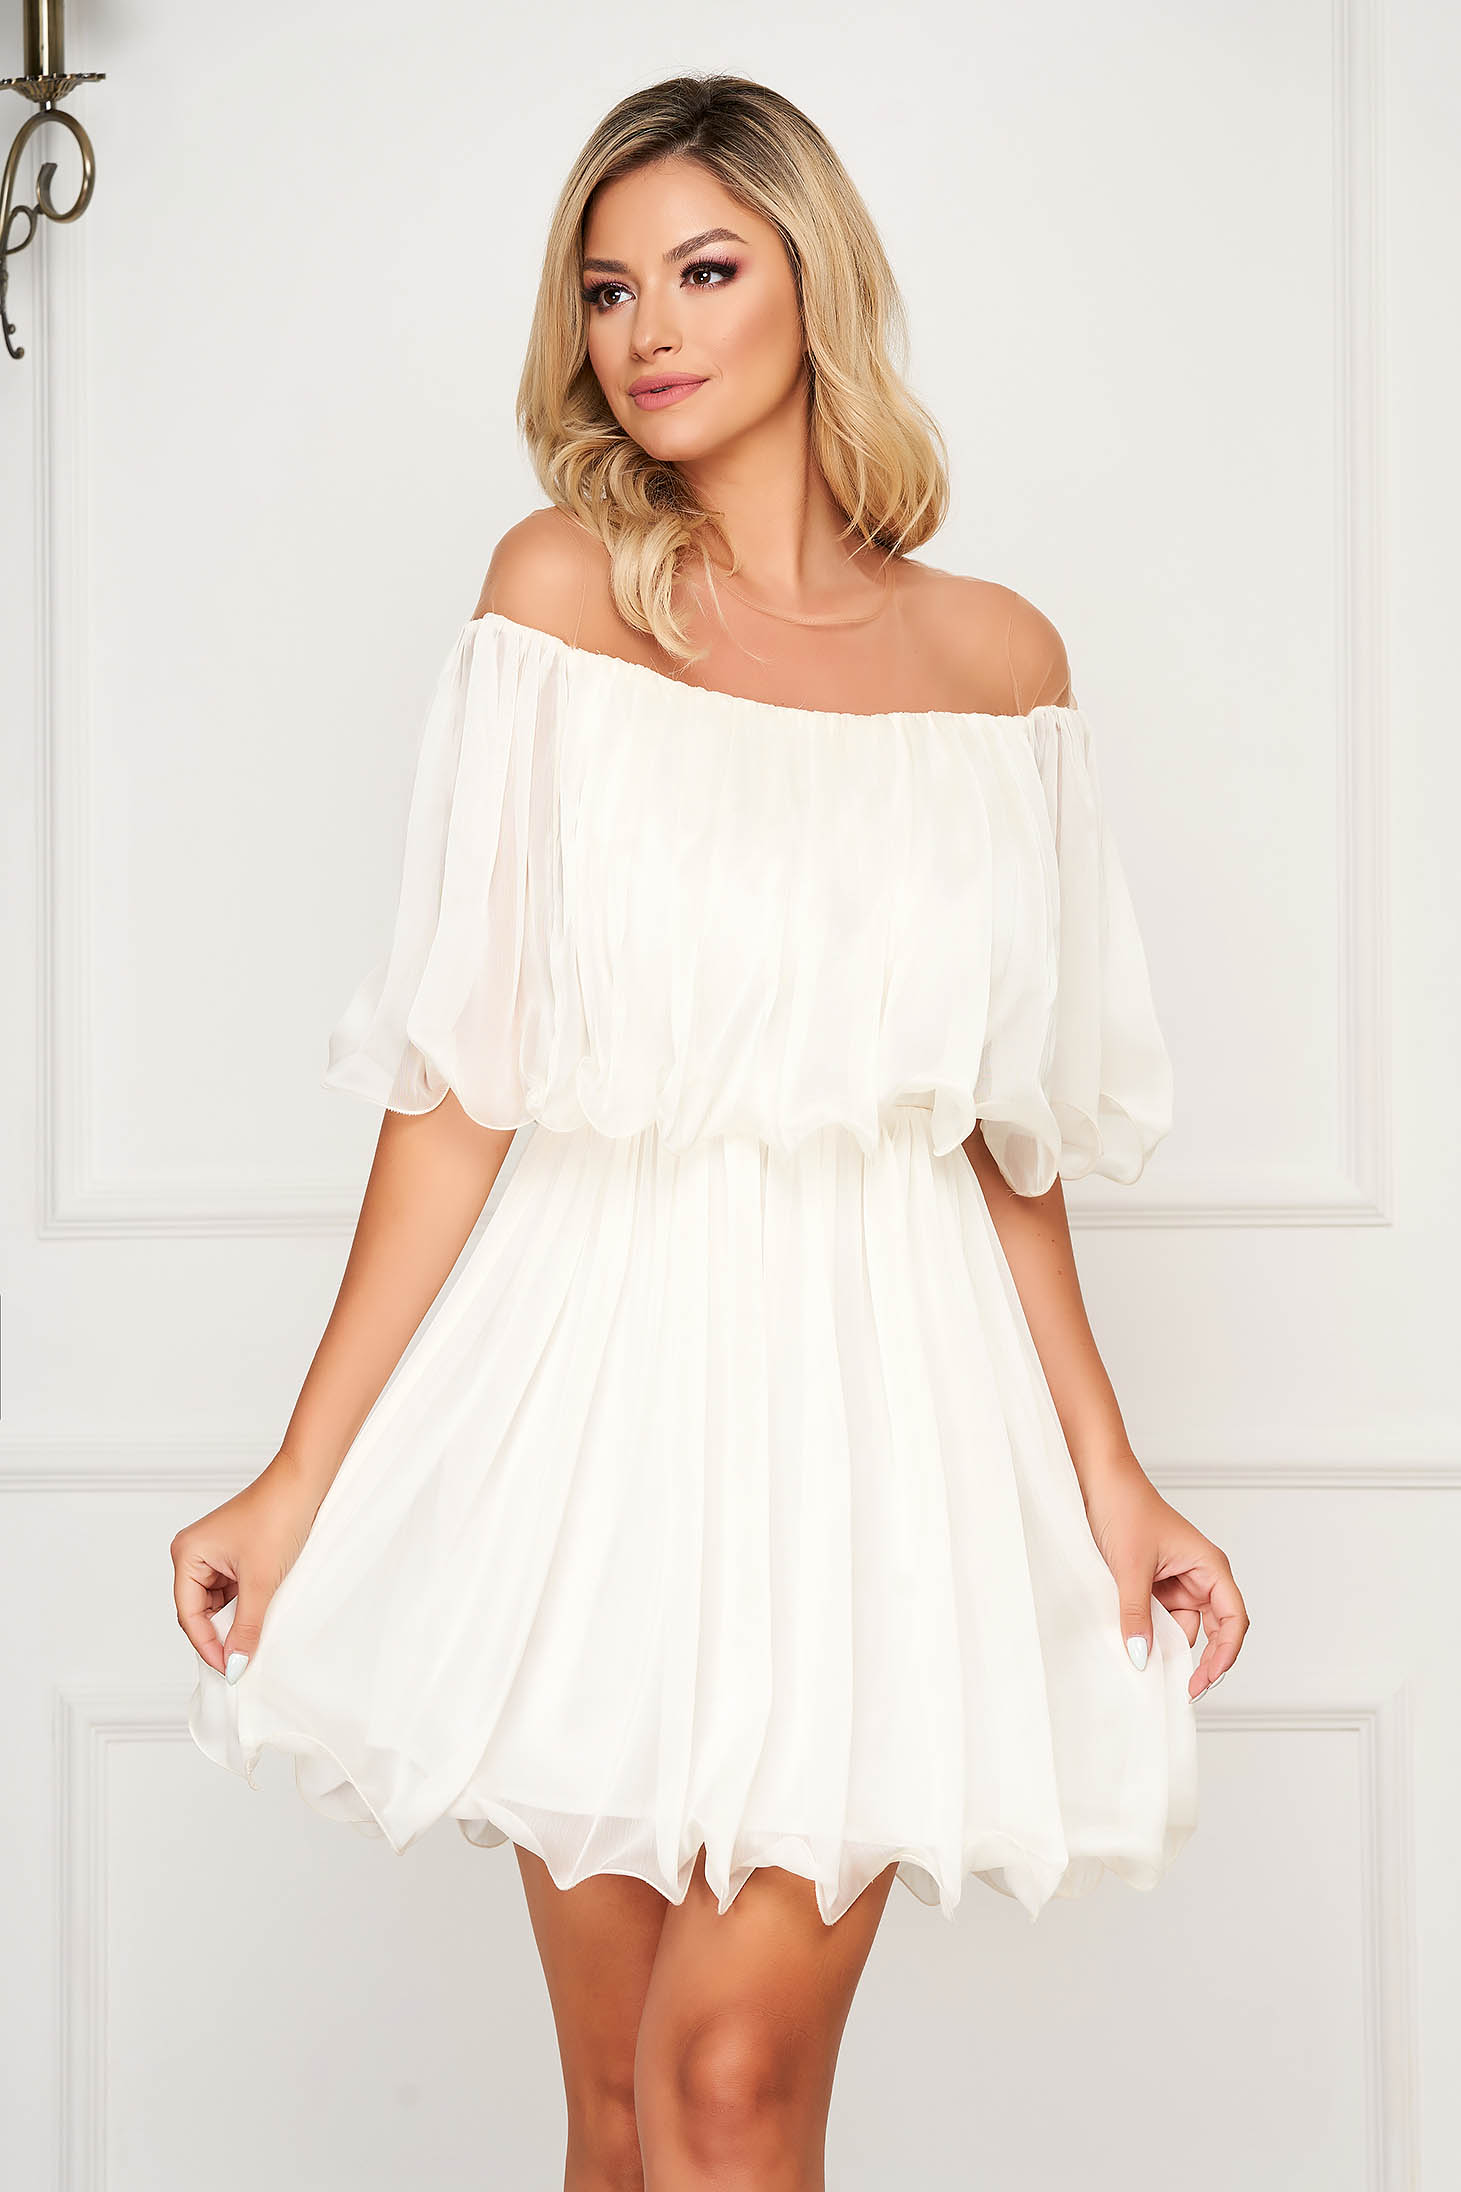 White dress short cut cloche off-shoulder occasional thin fabric